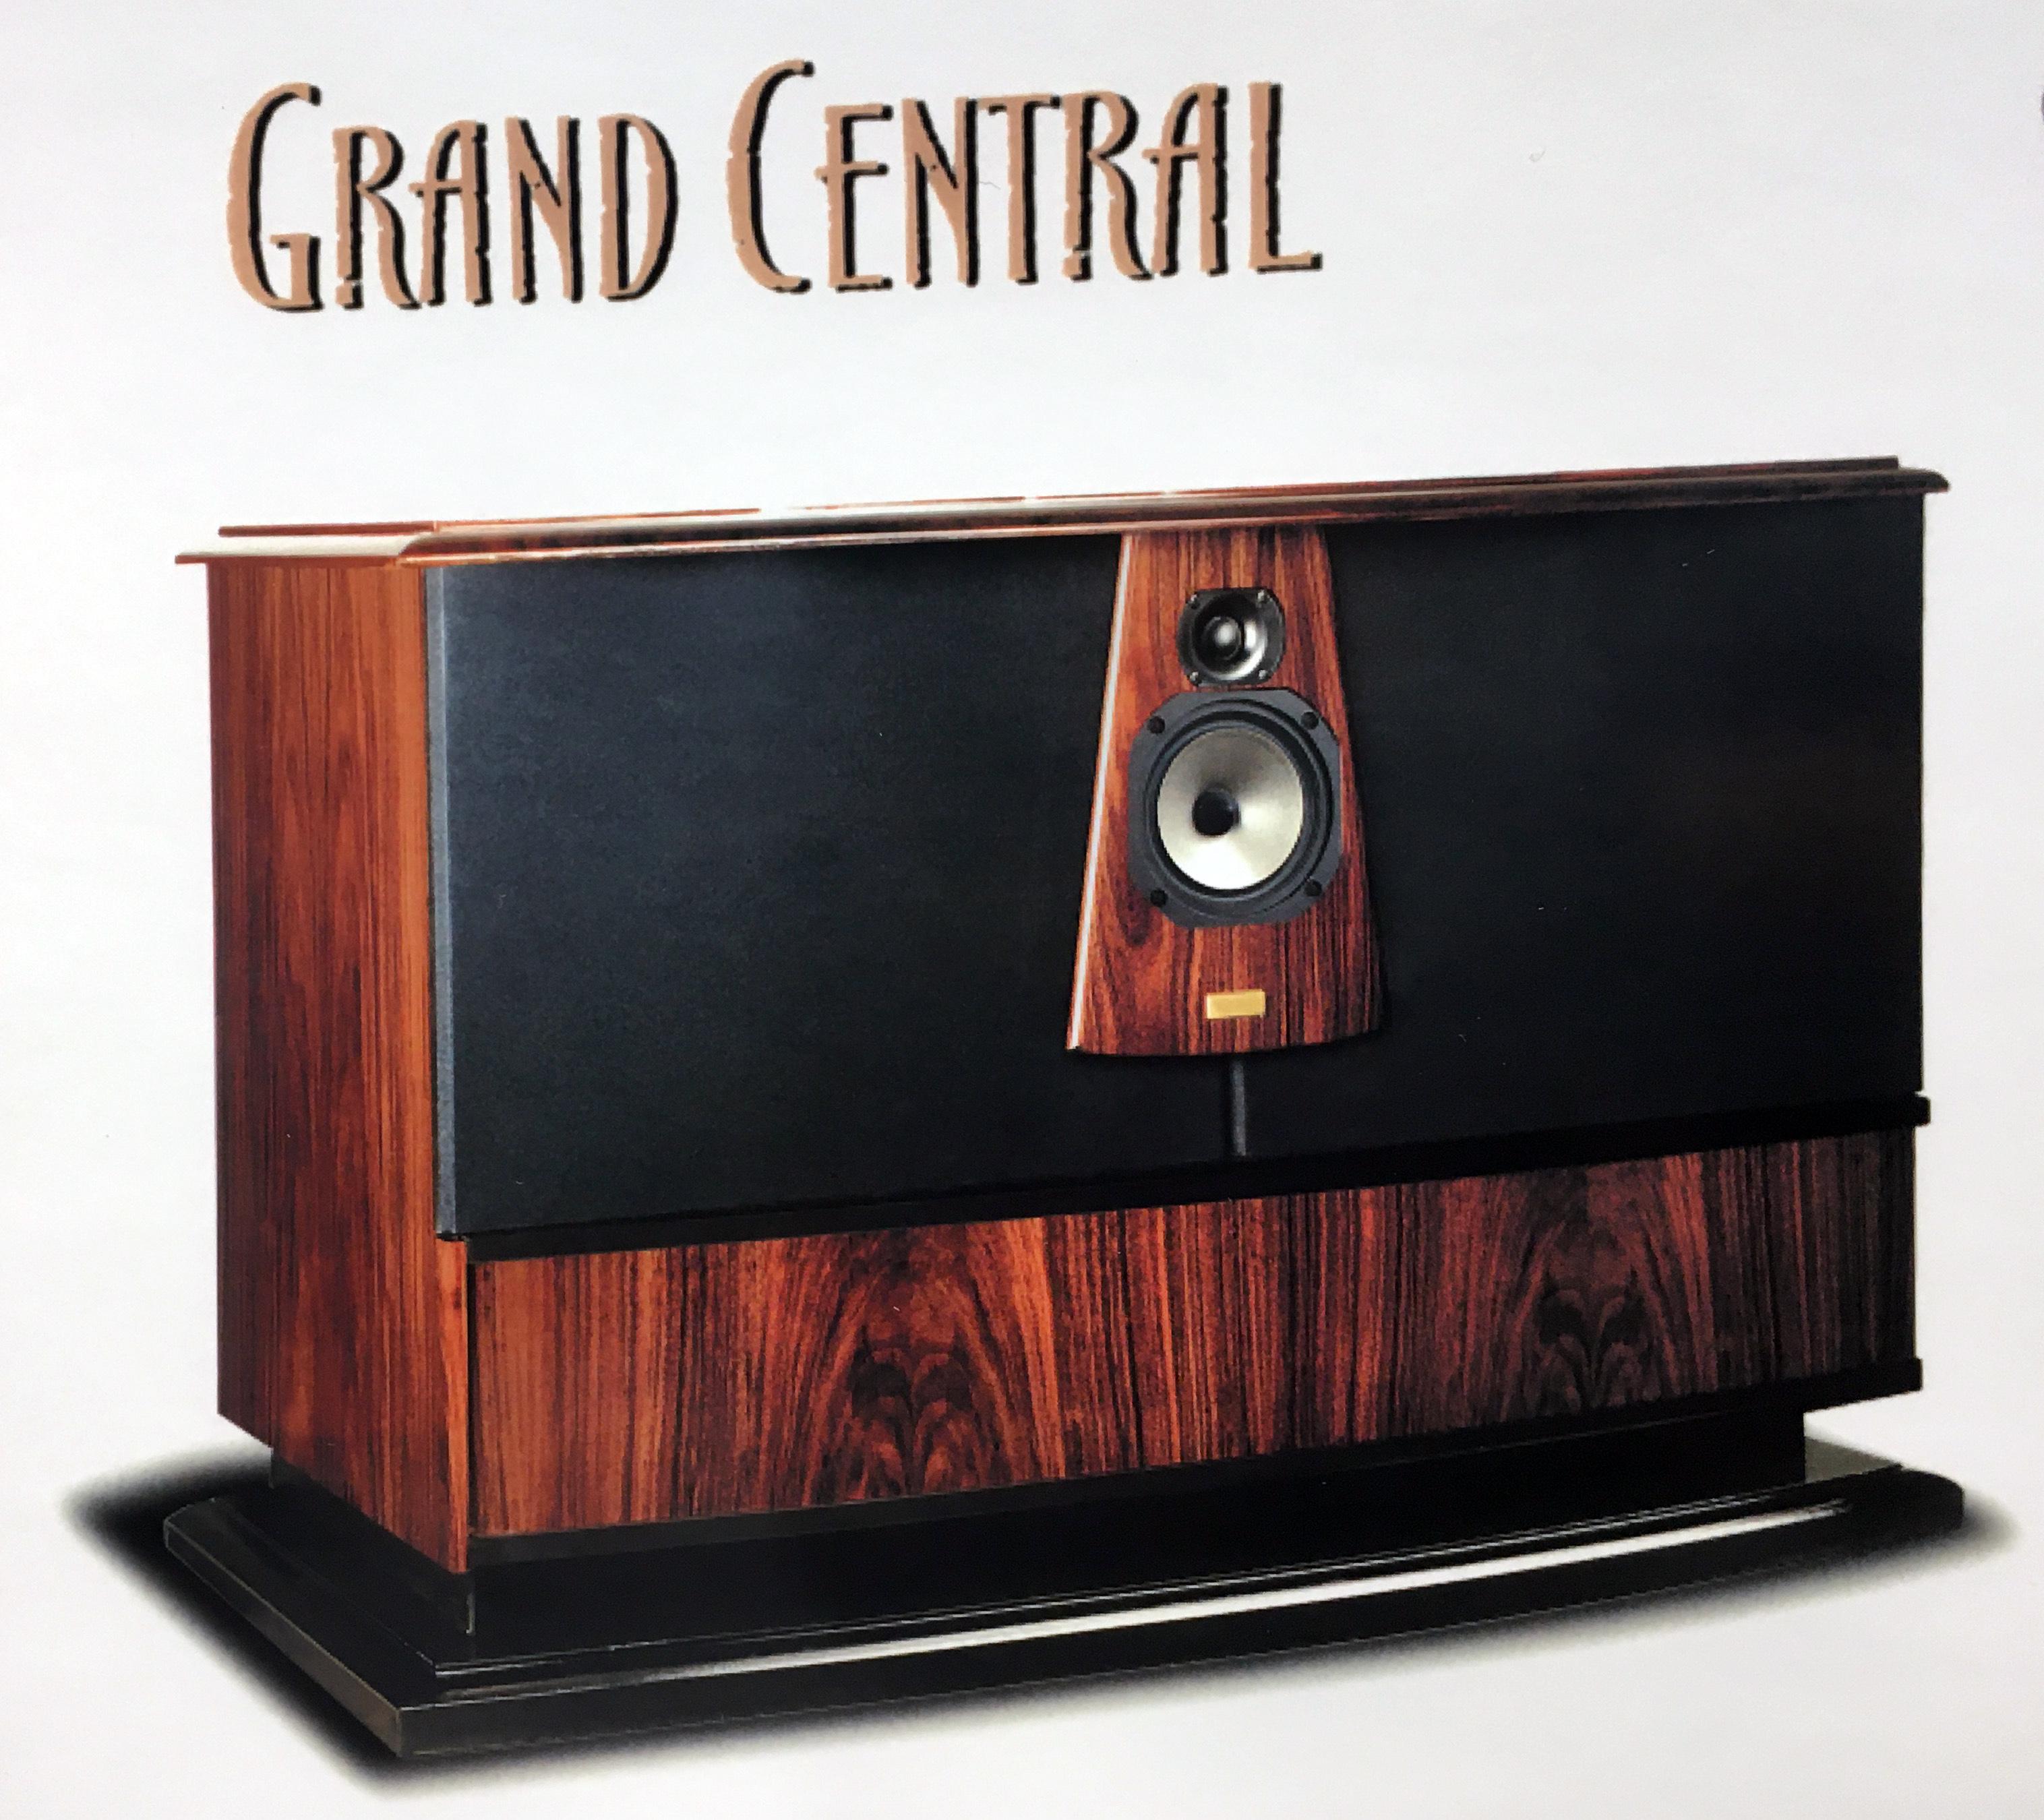 GrandCentral.jpg